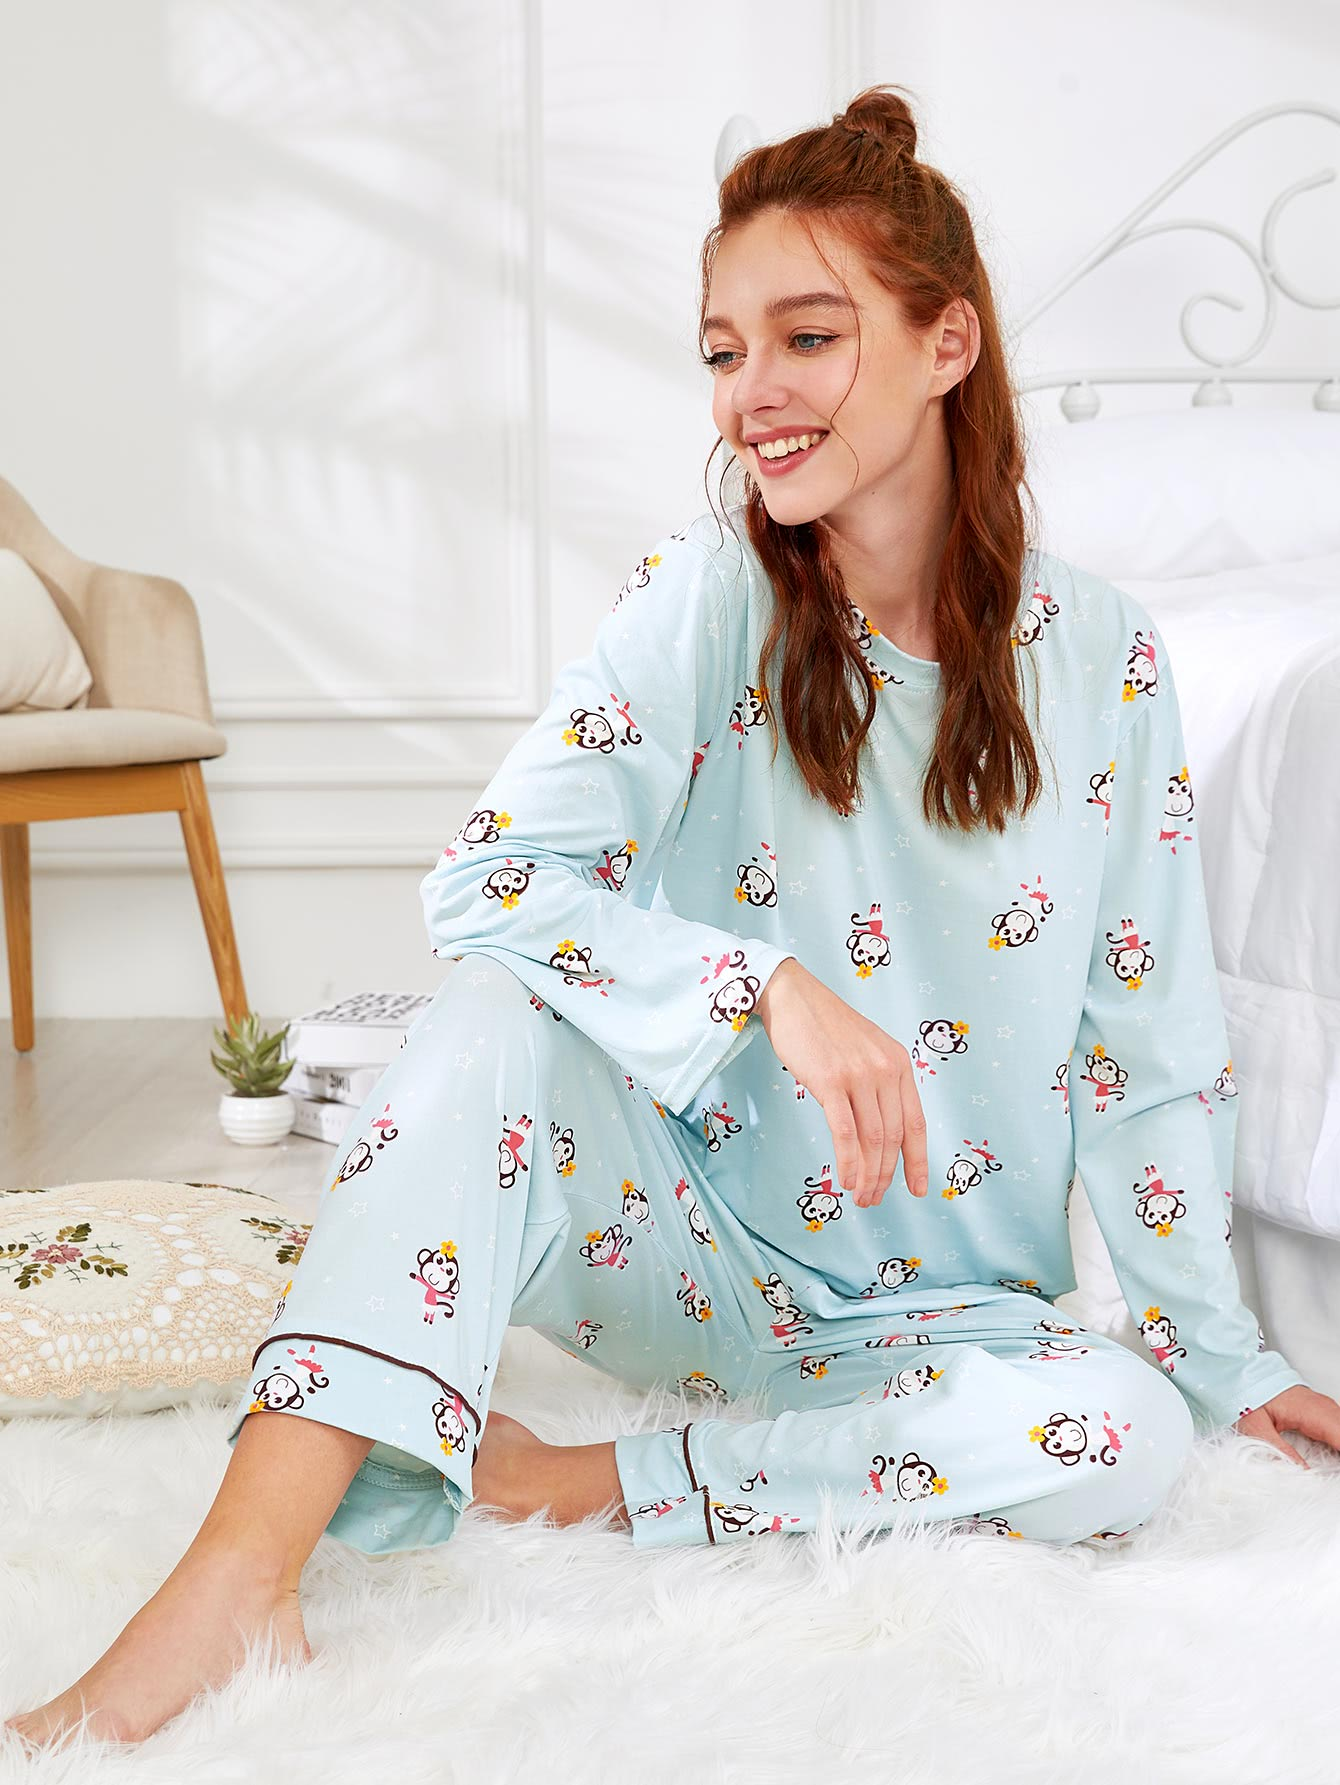 Monkey Print Tee & Pants PJ Set exmork 100 вт 12 в poly si